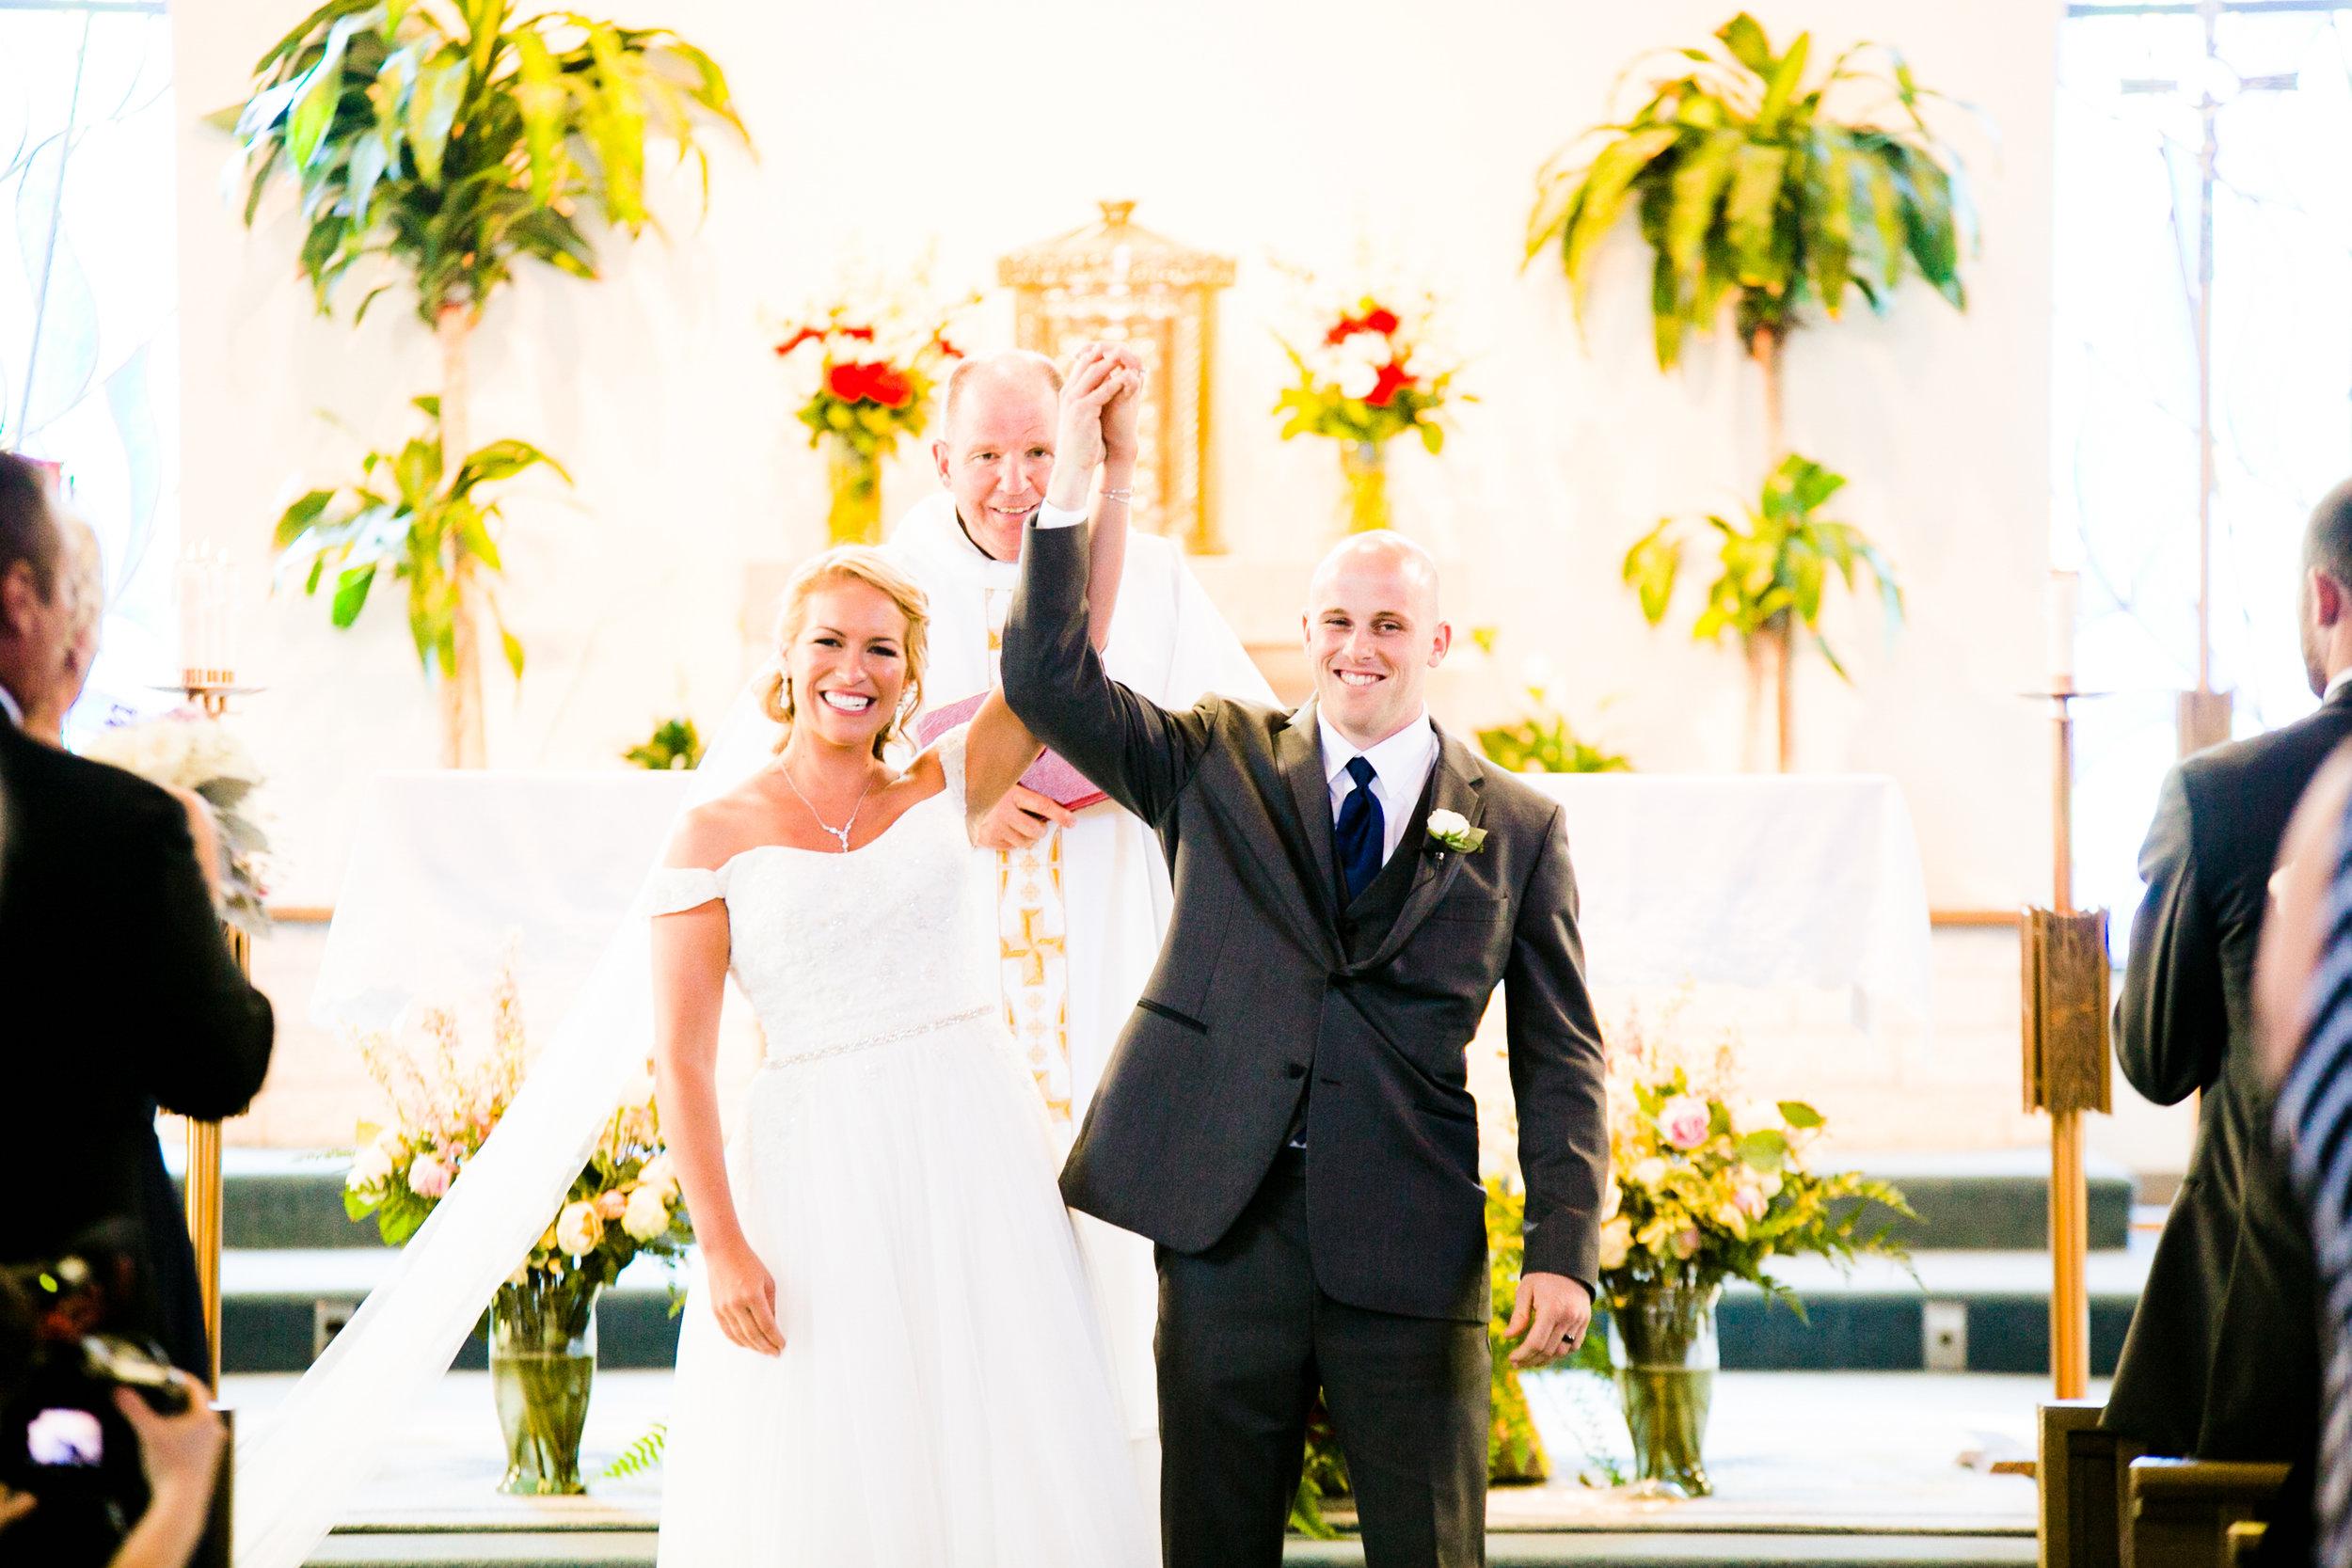 ICONA GOLDEN INN AVALON NJ WEDDING PHOTOGRAPHY  - 052.jpg